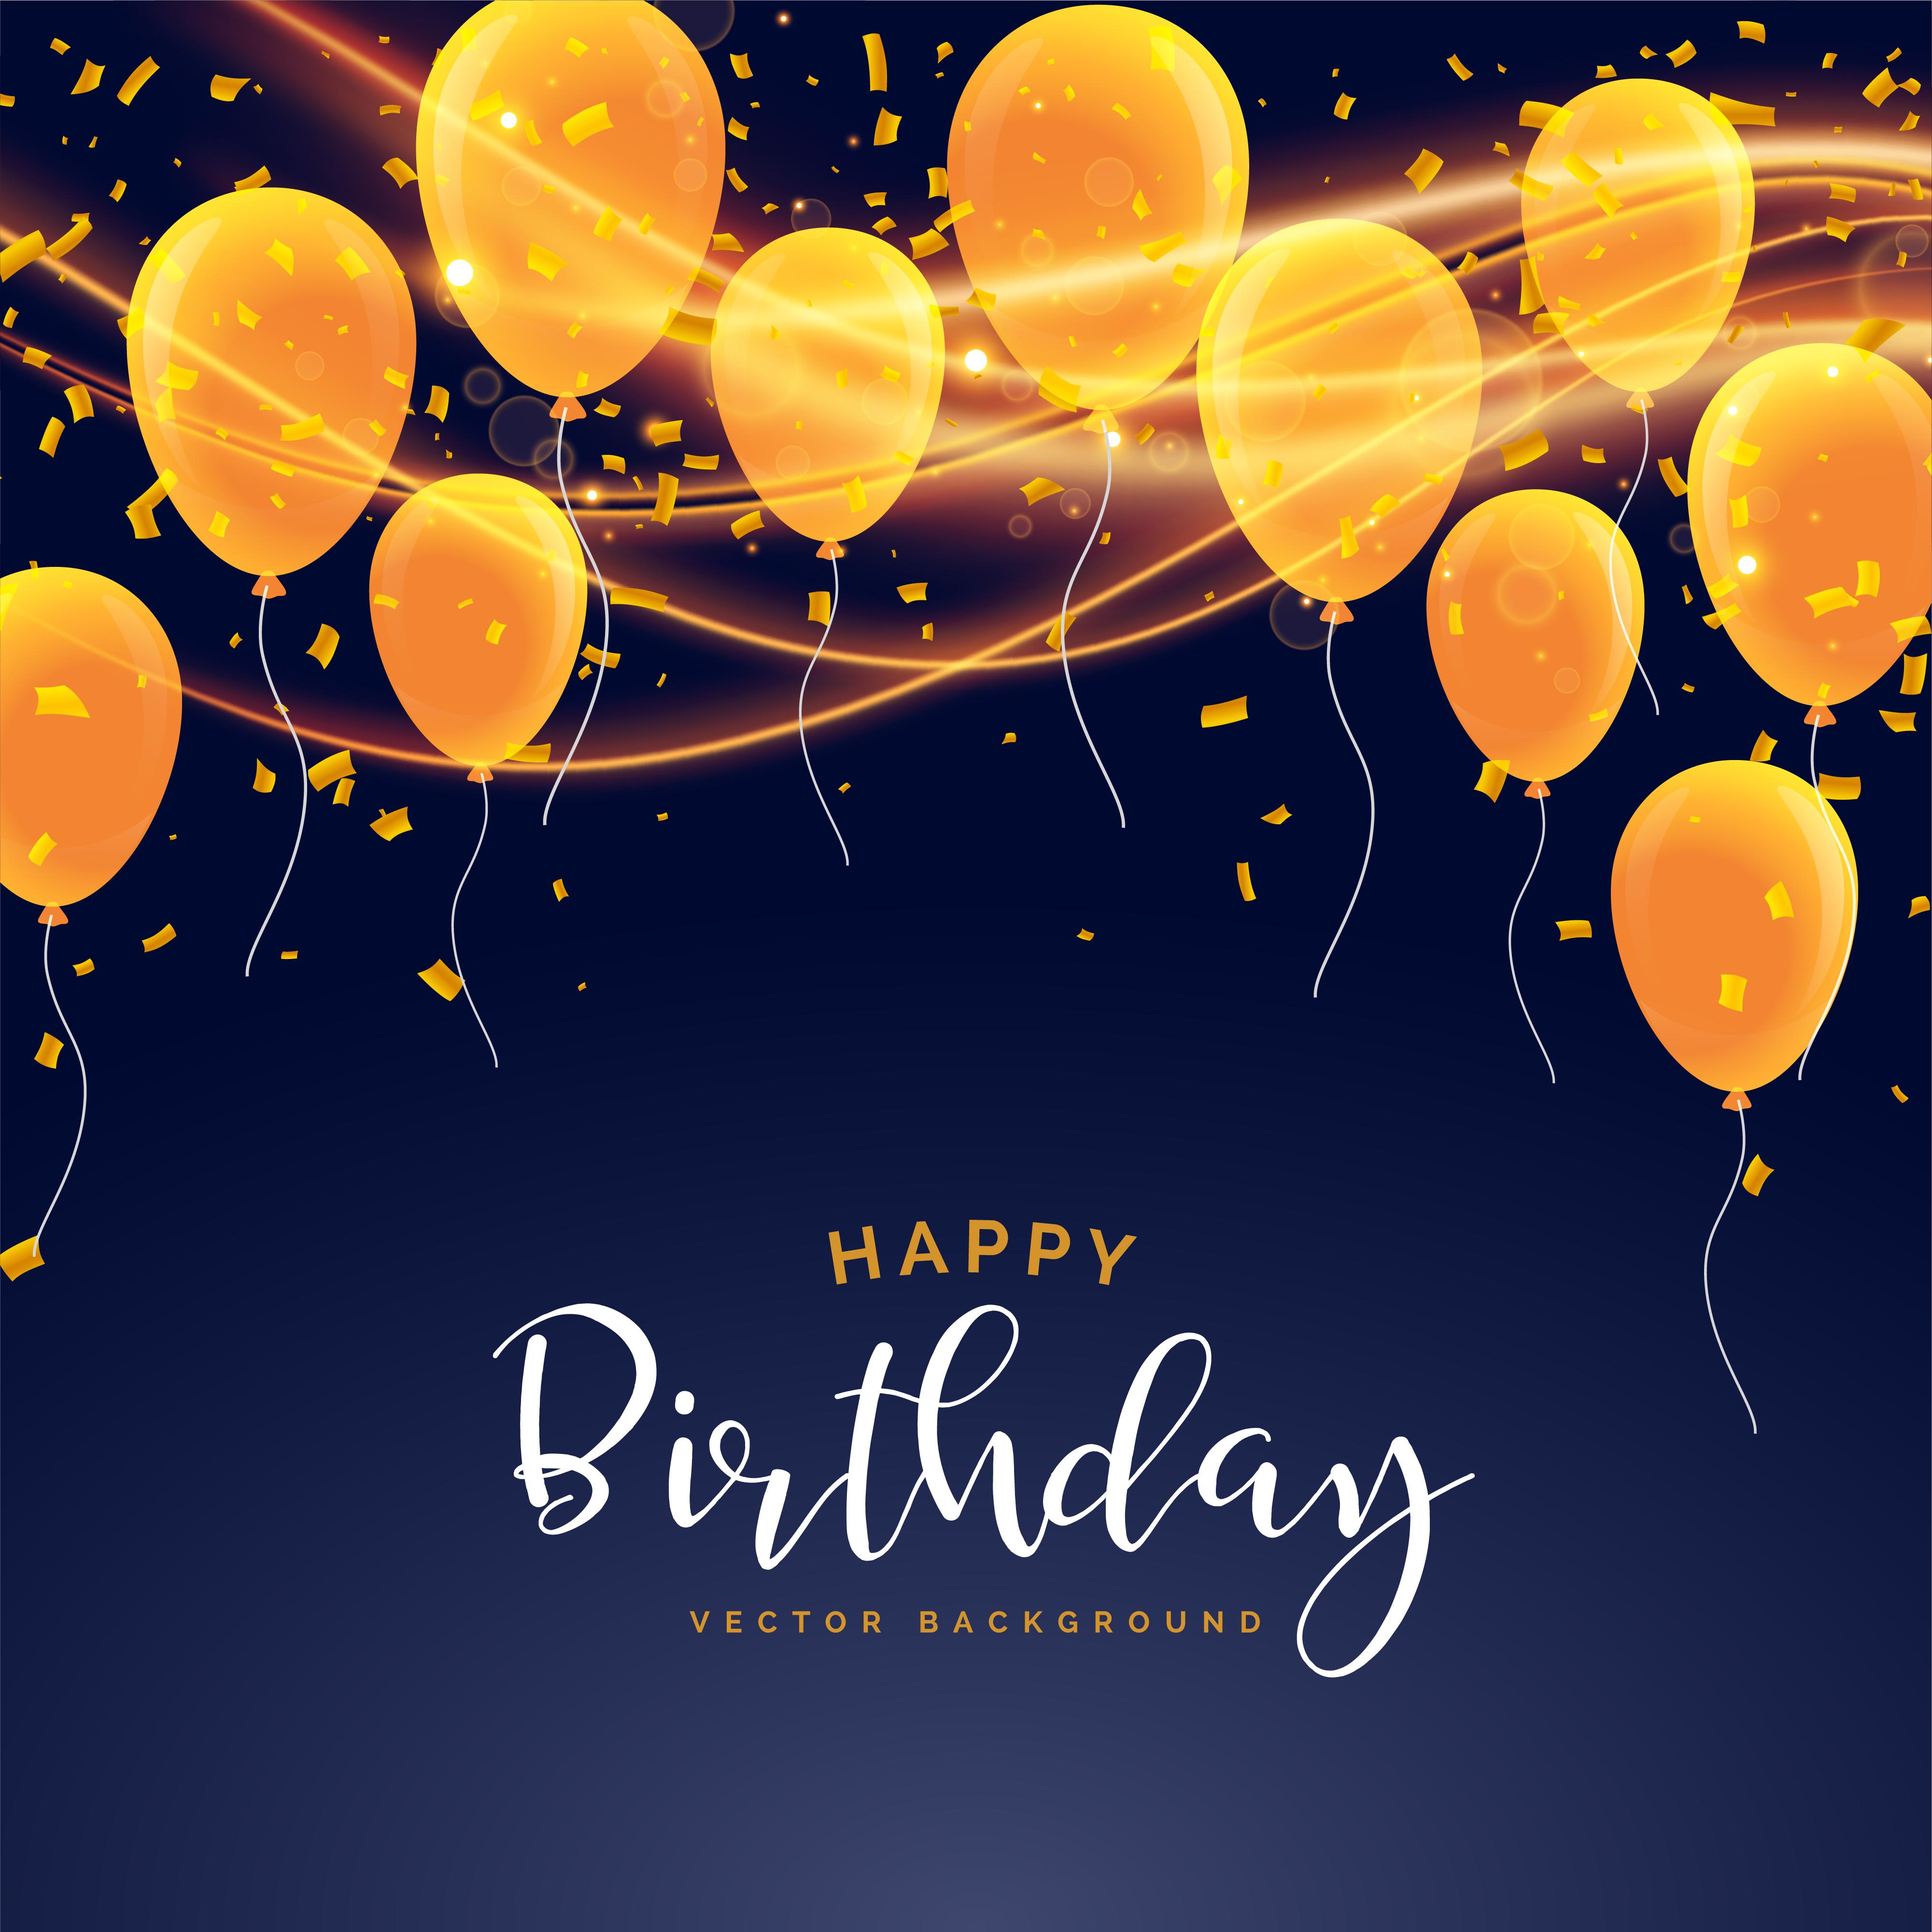 happy birthday celebration card design download free vector art stock graphics images. Black Bedroom Furniture Sets. Home Design Ideas